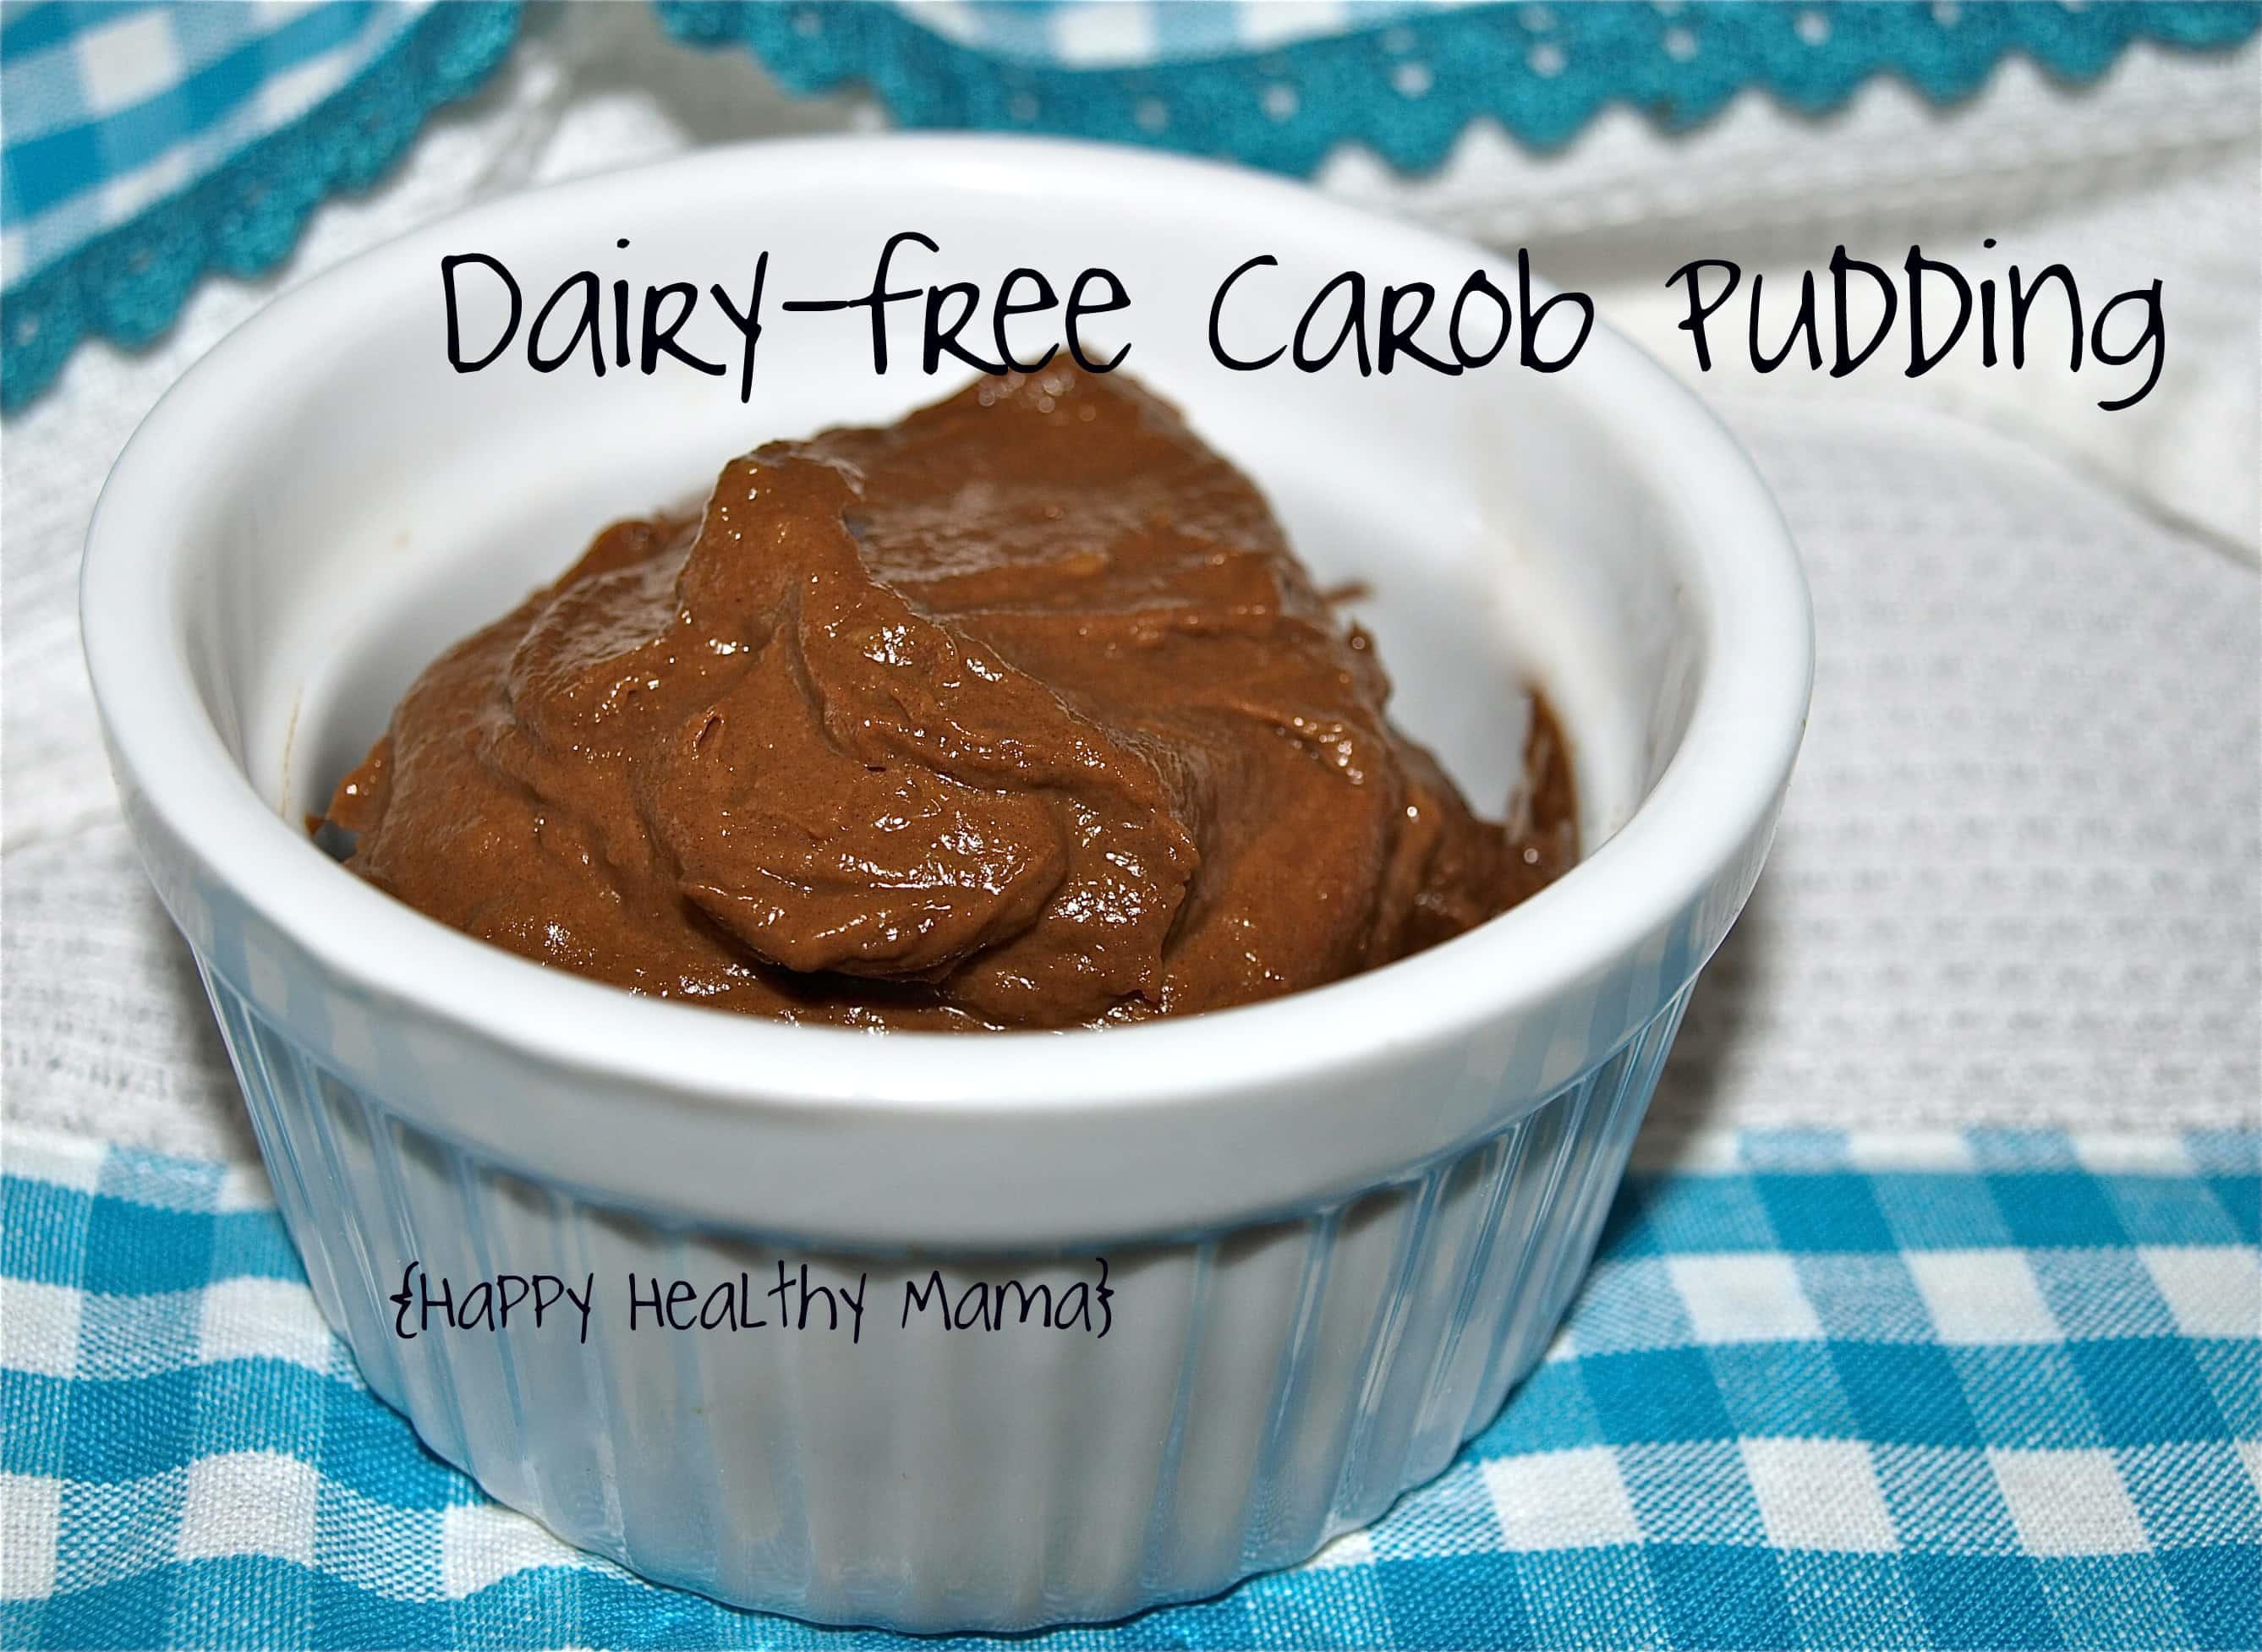 Dairy-Free Carob Pudding - Happy Healthy Mama